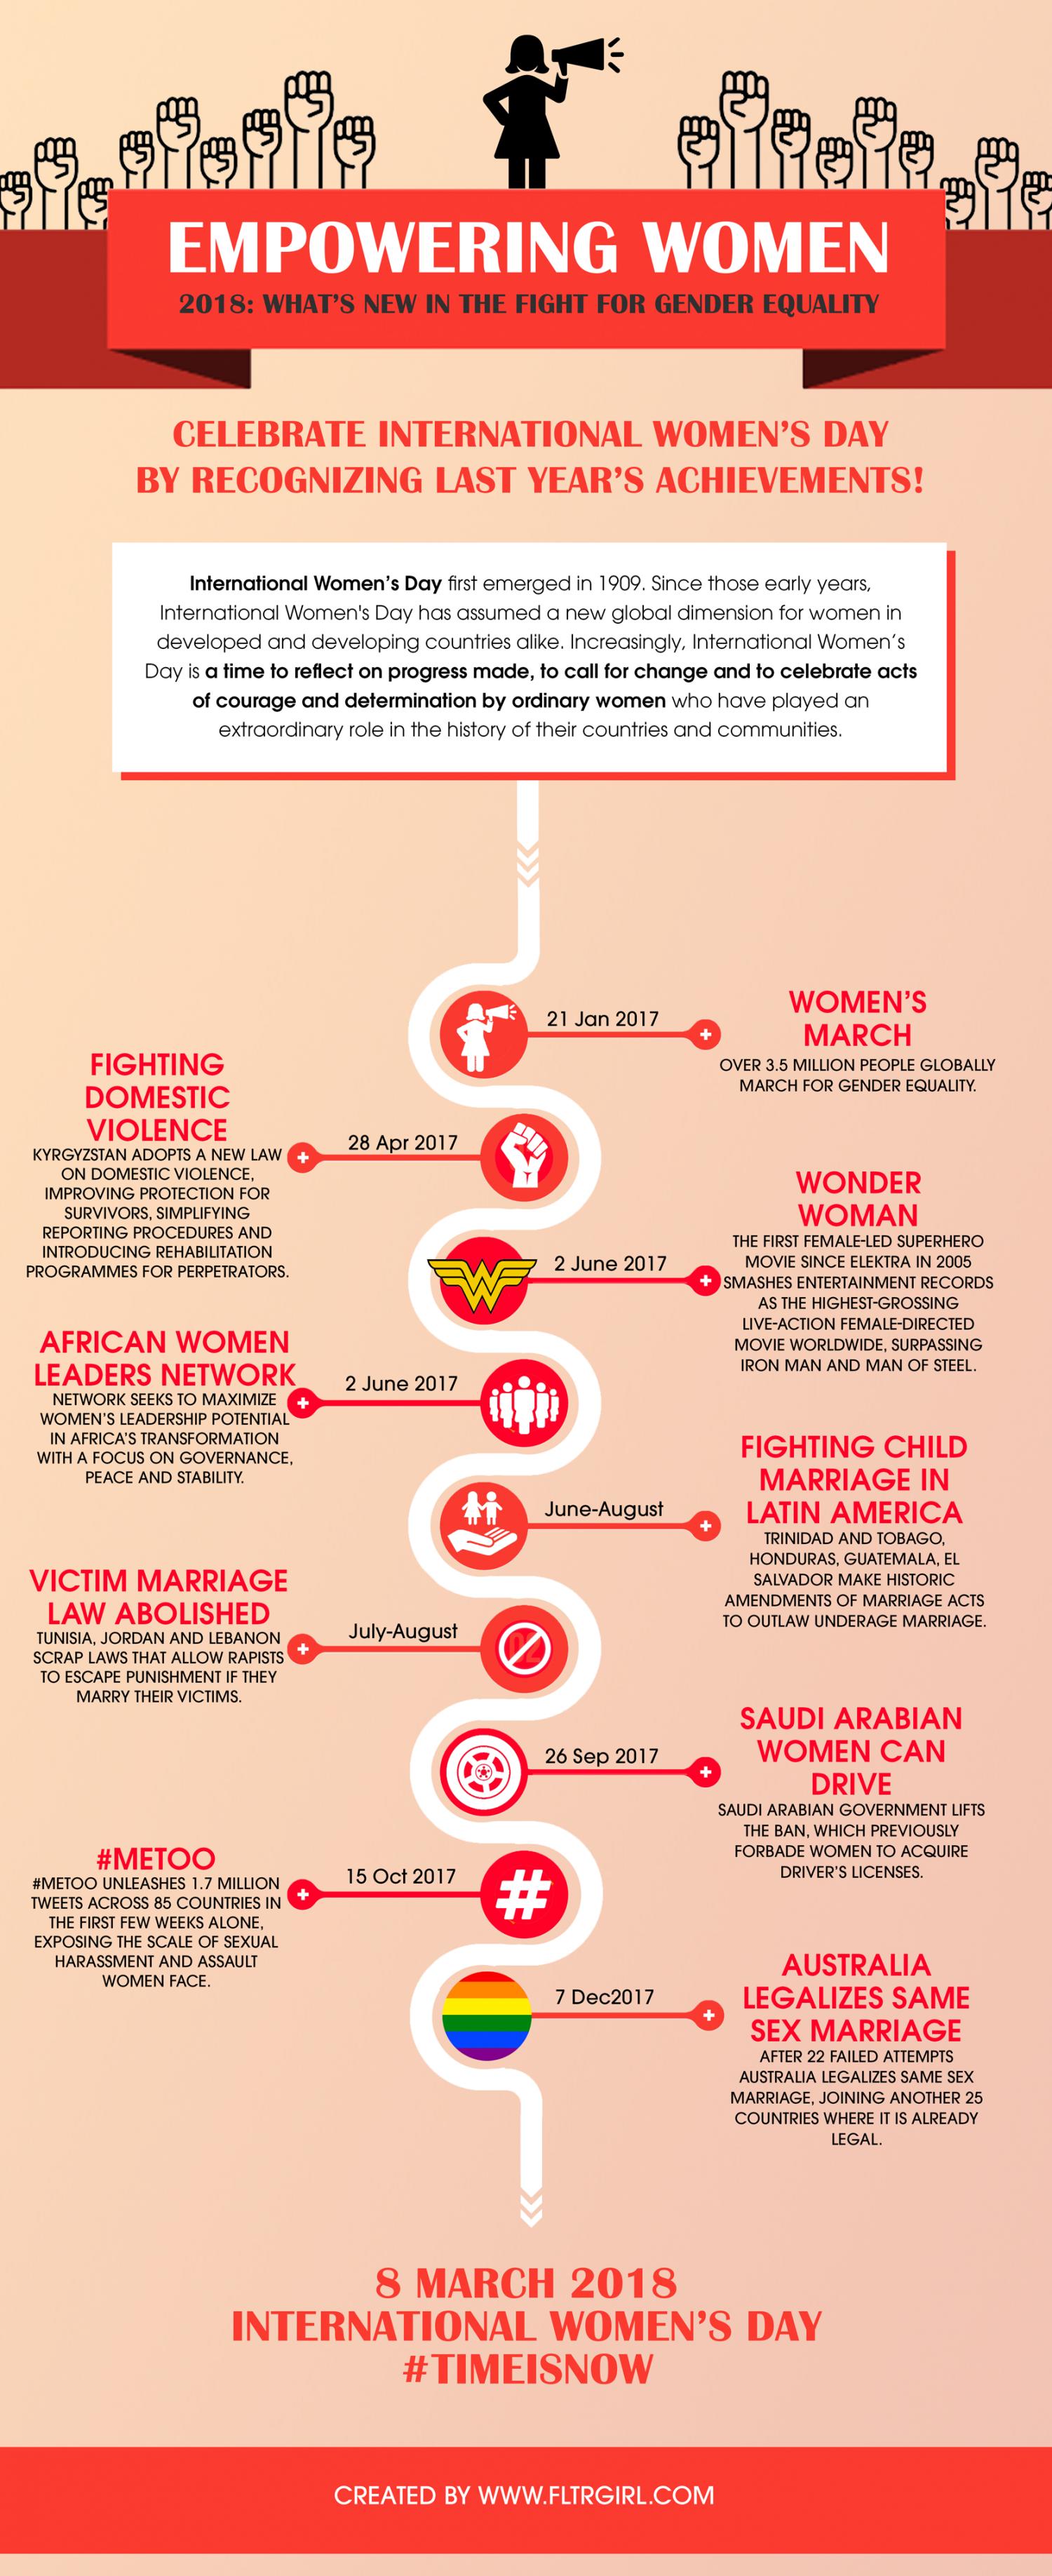 Women Empowerment 2018 Celebrating Latest Feminist Achievement On S Day Infographic Girlpower Ladybos Bo Slogan Short Essay